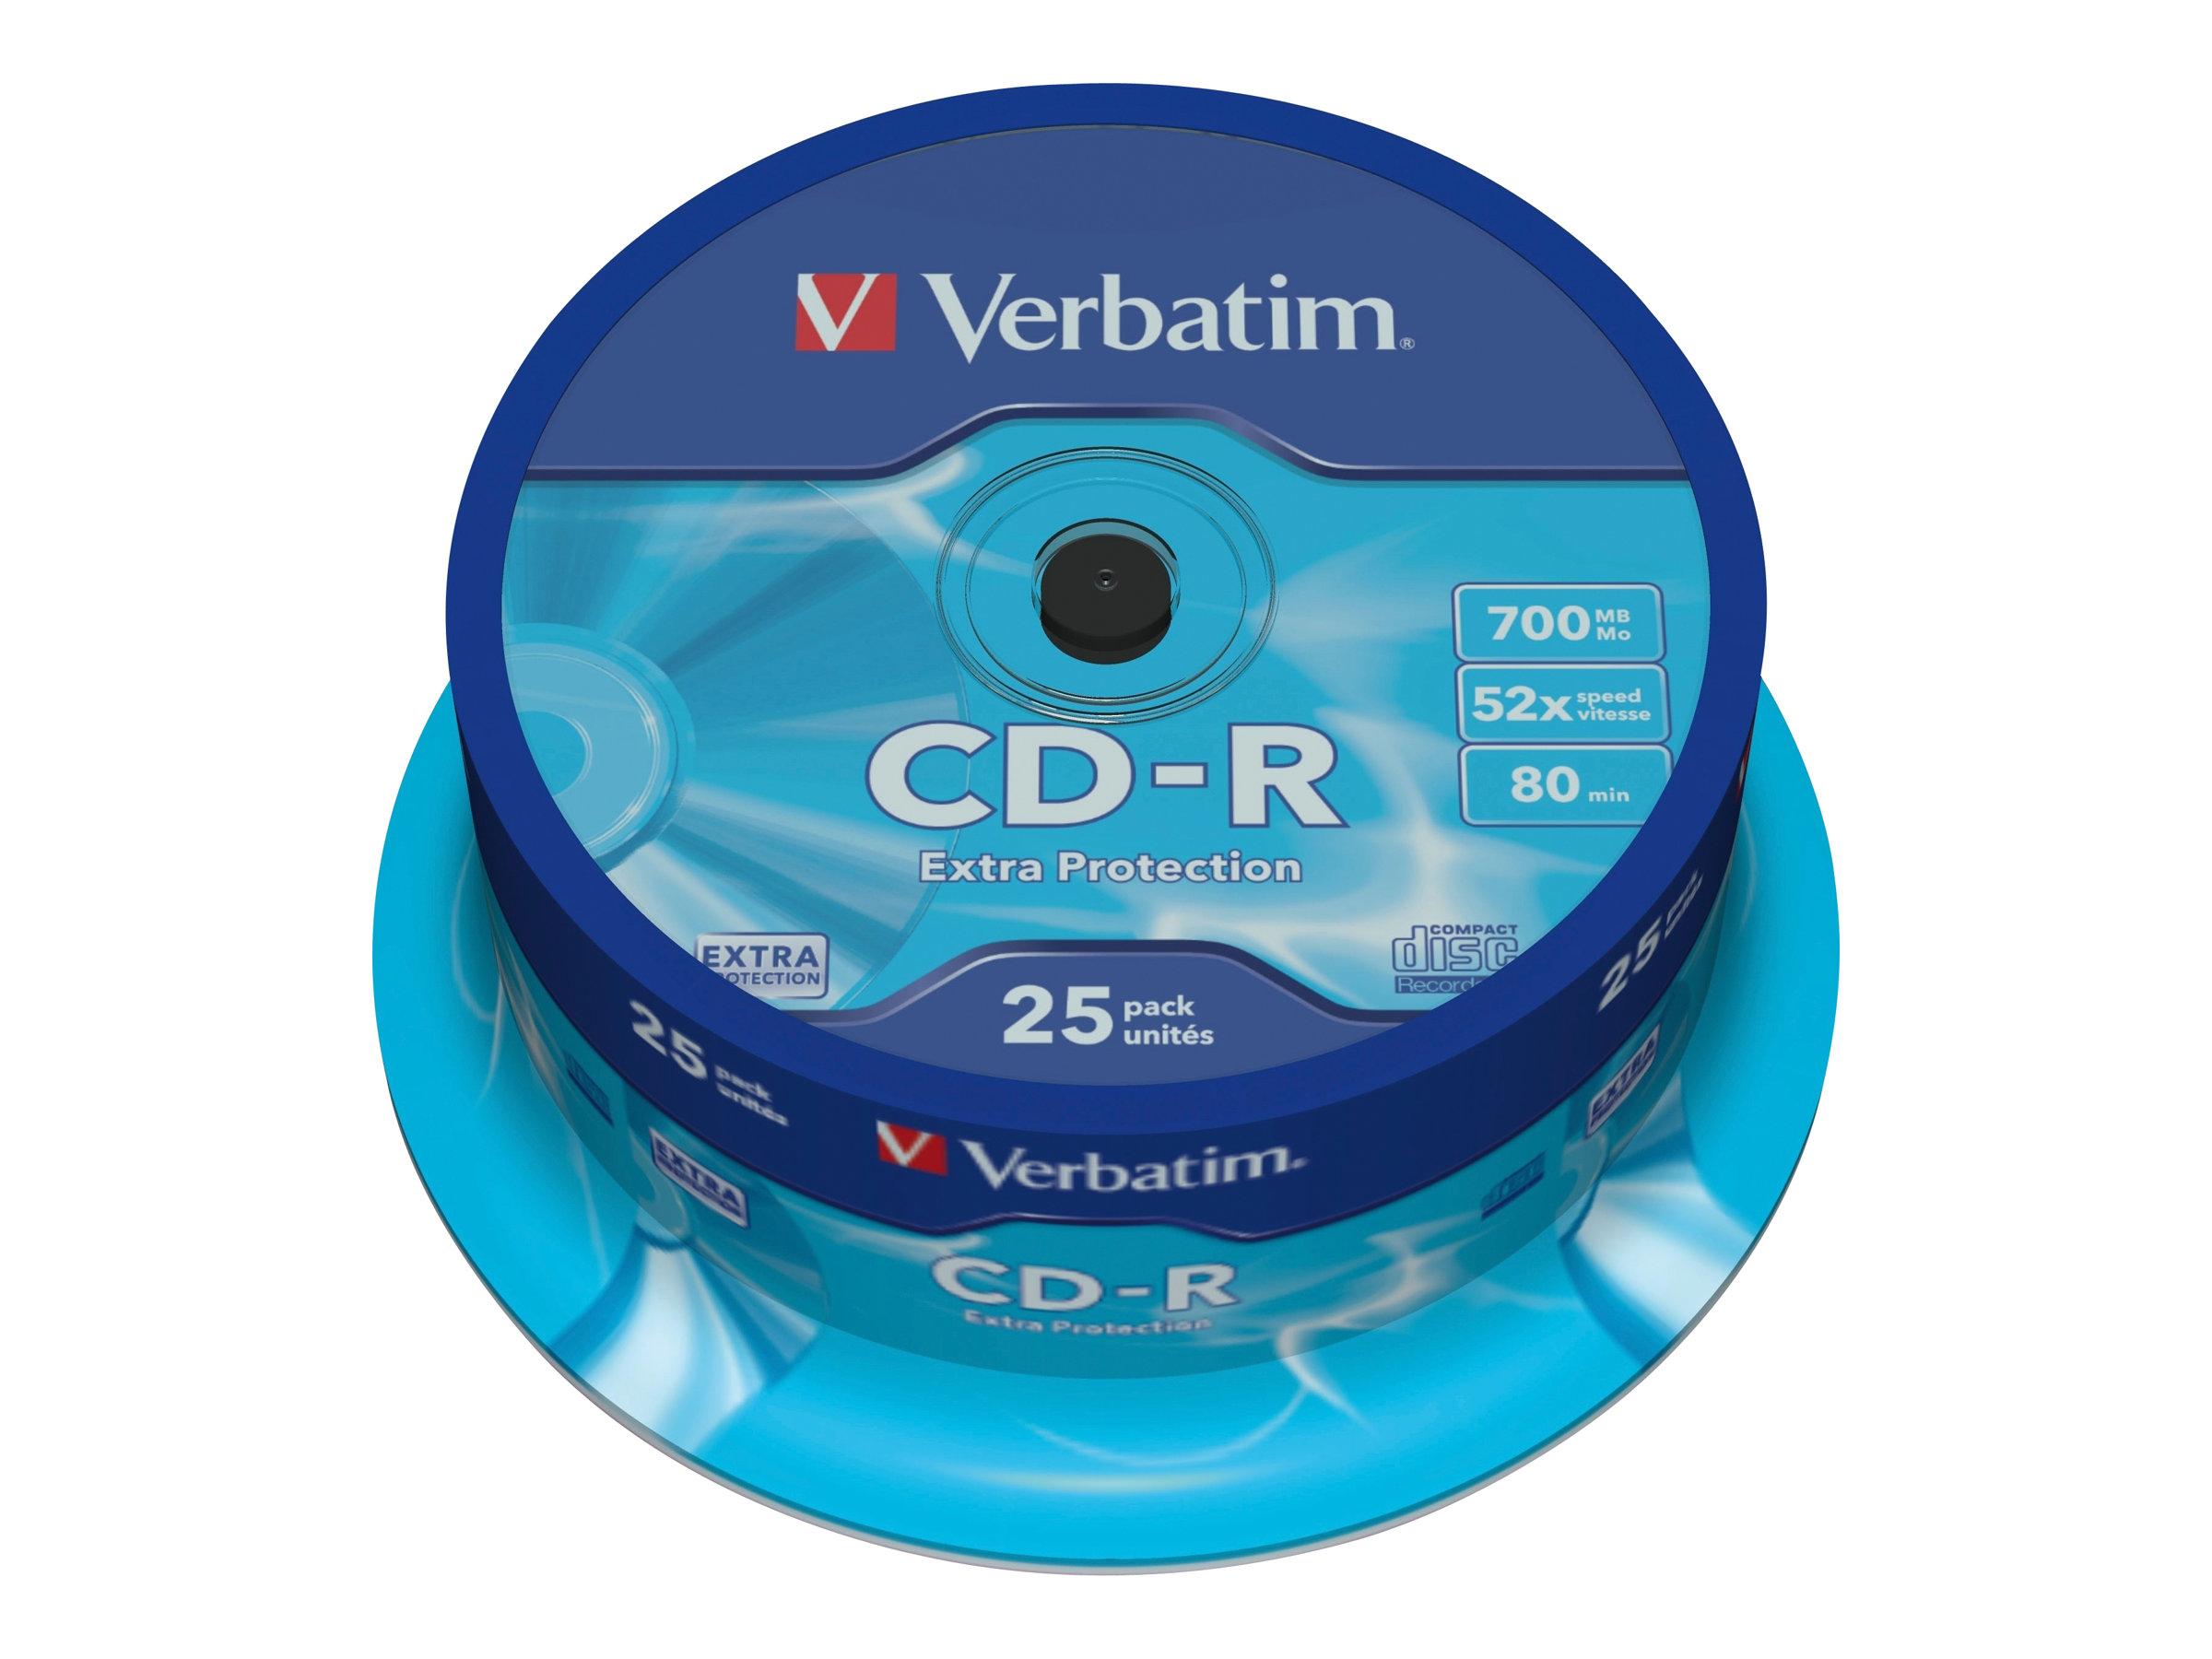 Verbatim CD-R Extra Protection - 25 x CD-R - 700 MB 52x - Spindel